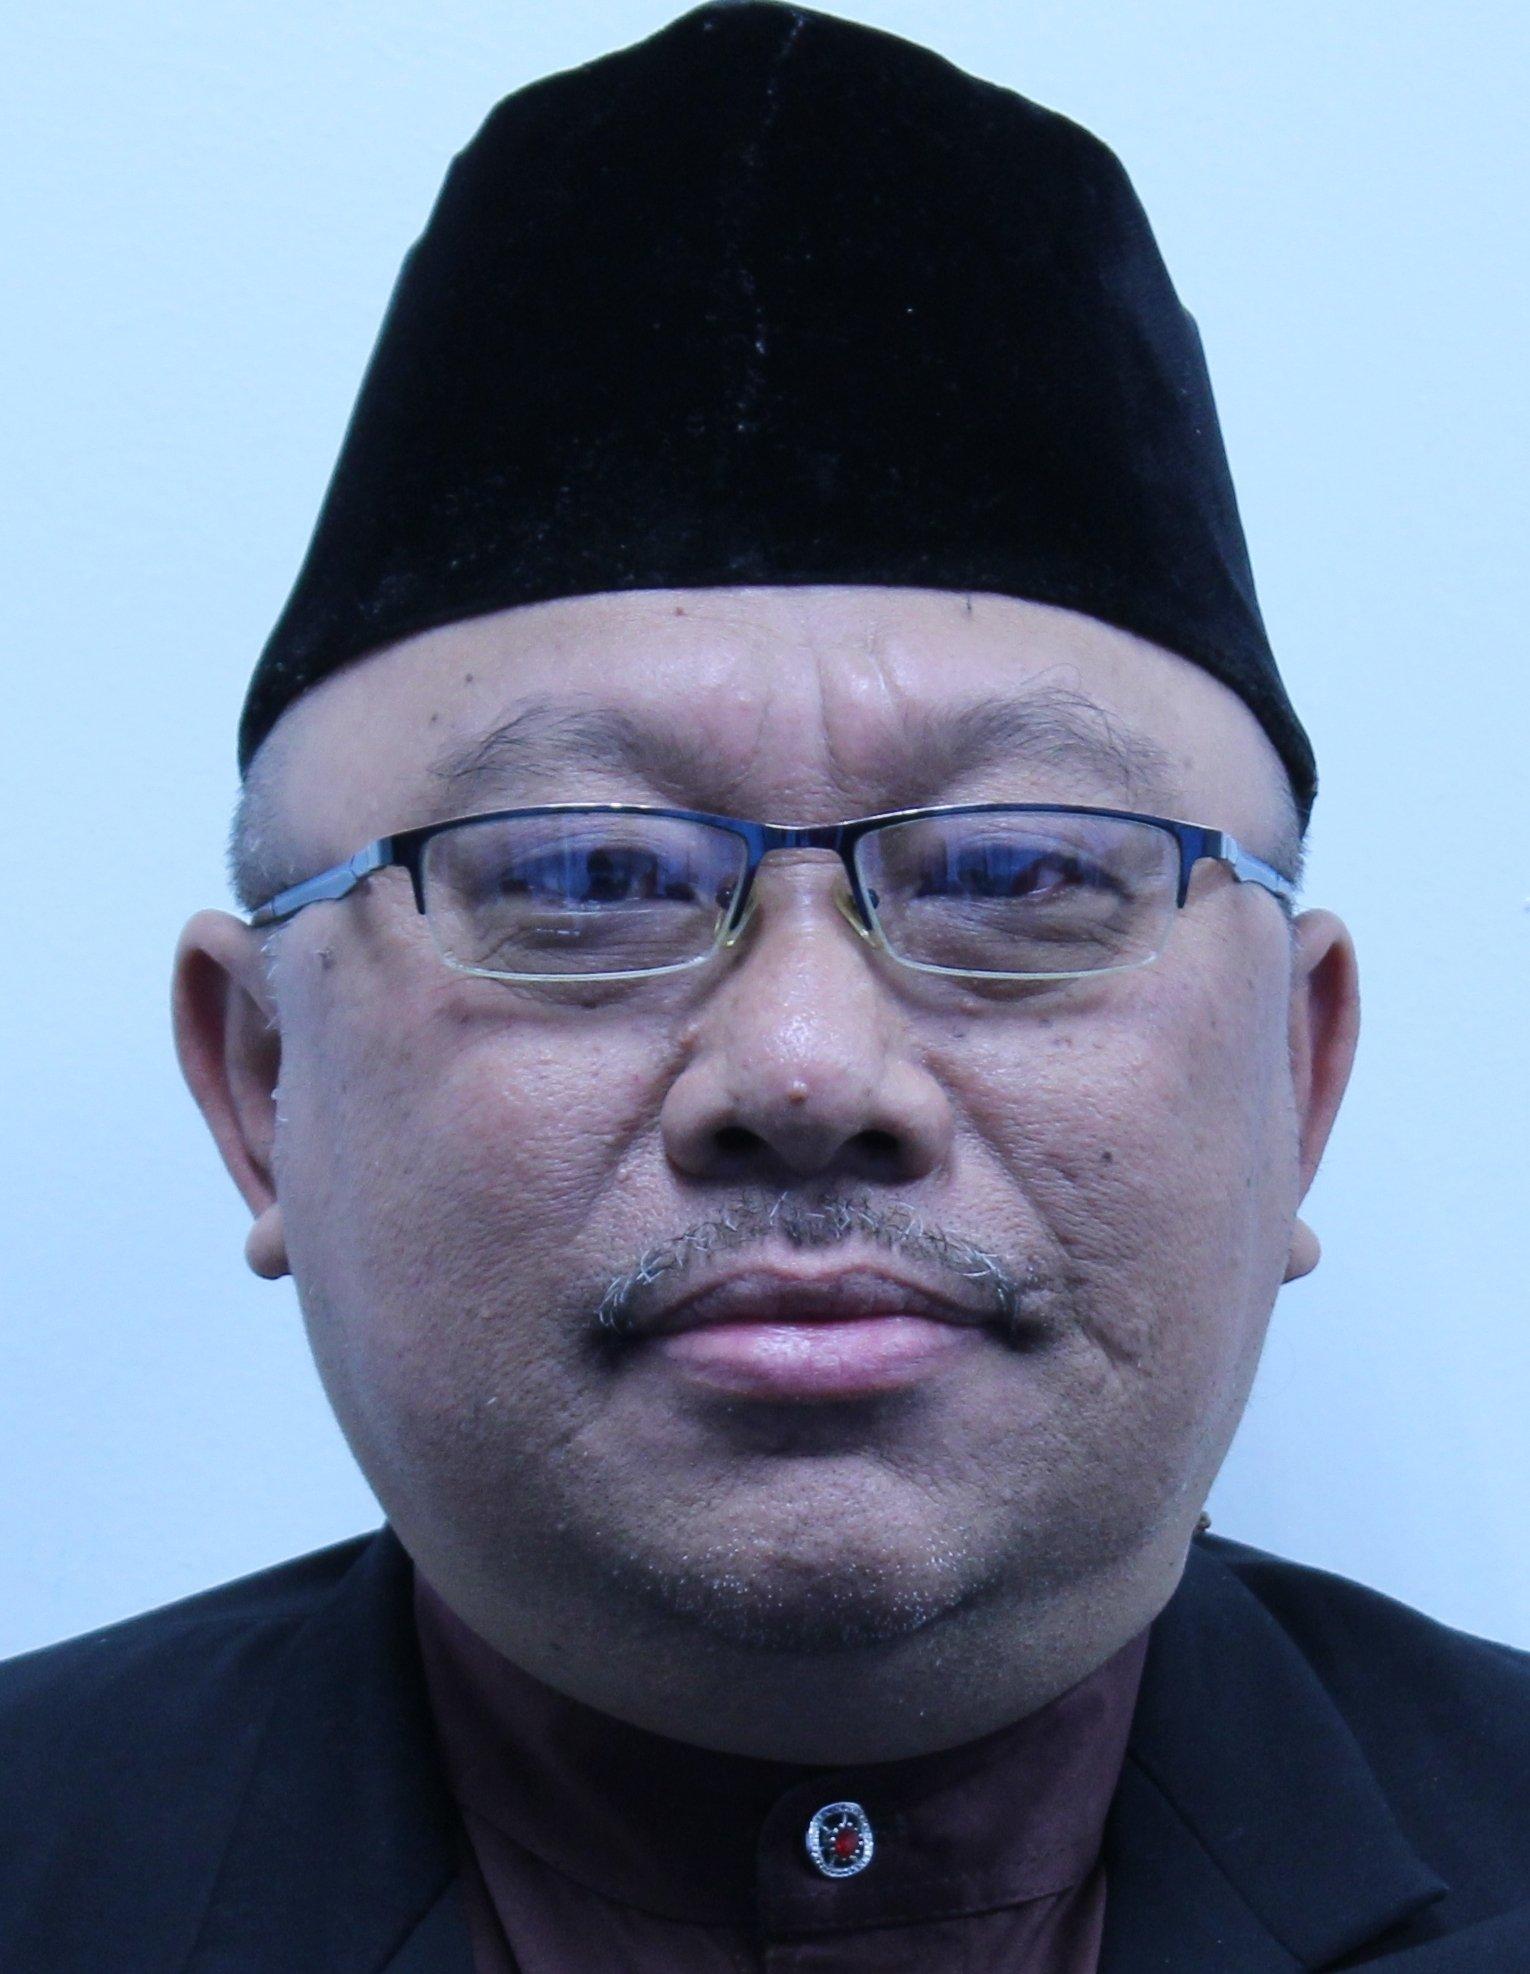 Encik Jaffry Bin Salleh